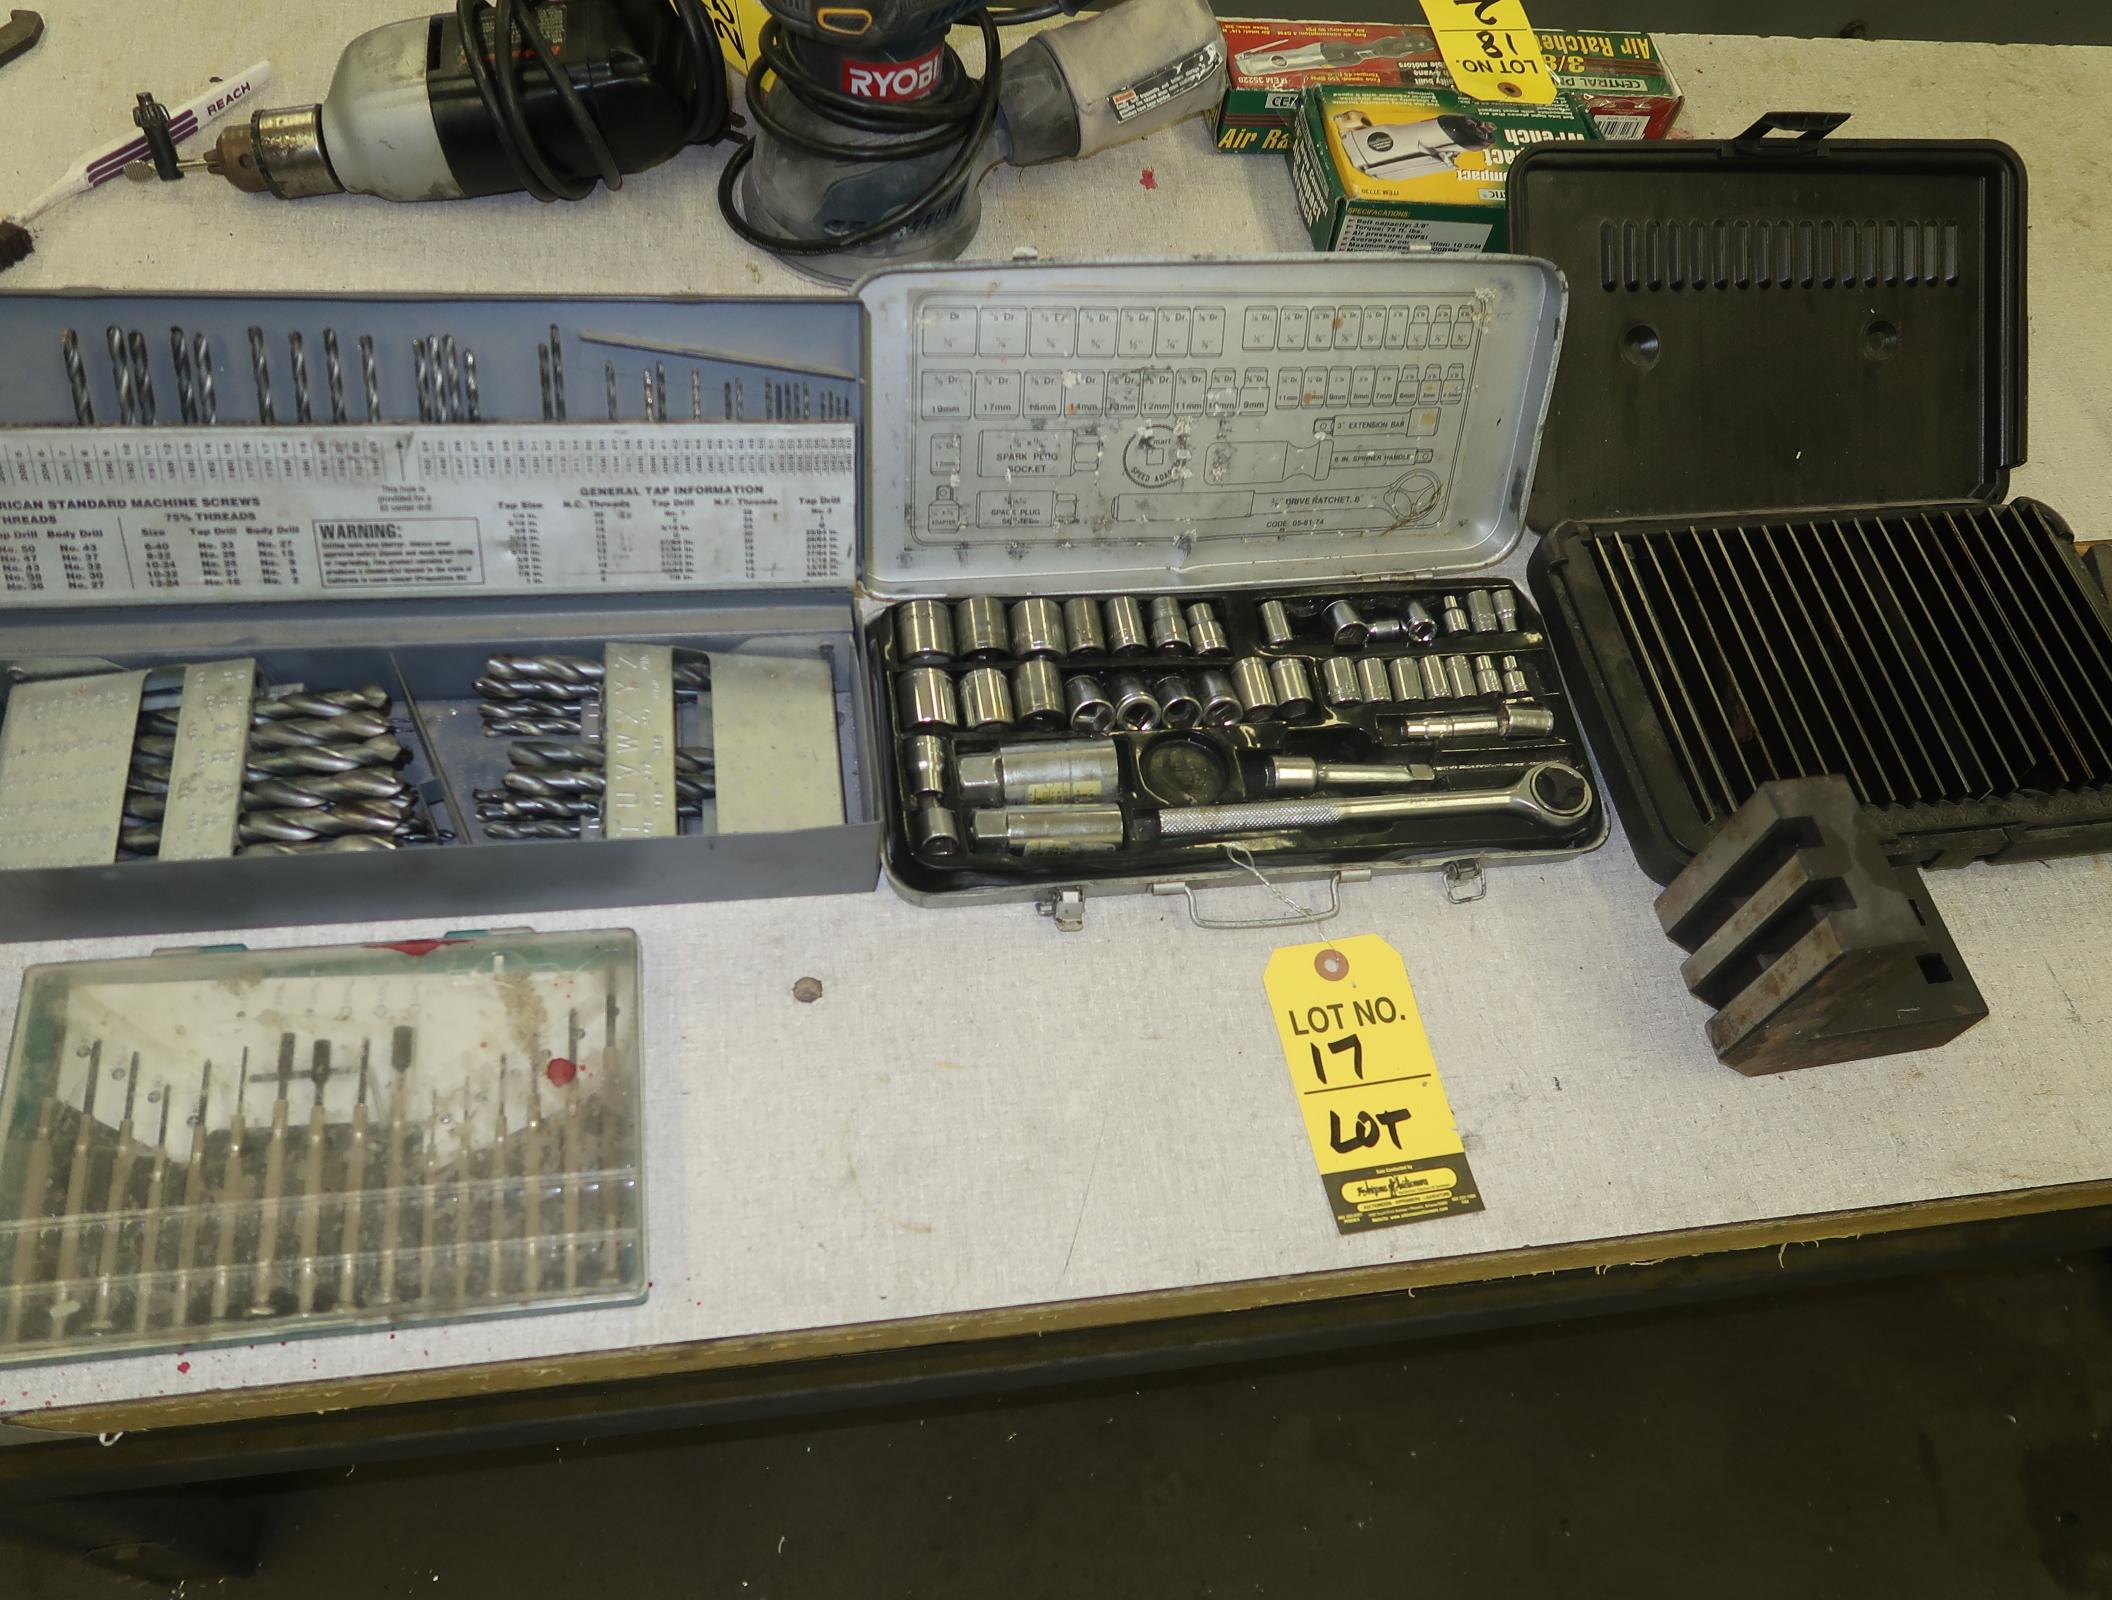 LOT SOCKET SET, DRILL INDEX, PARALELLS, SMALL DRIVER SET, (2) KNIFE SETS